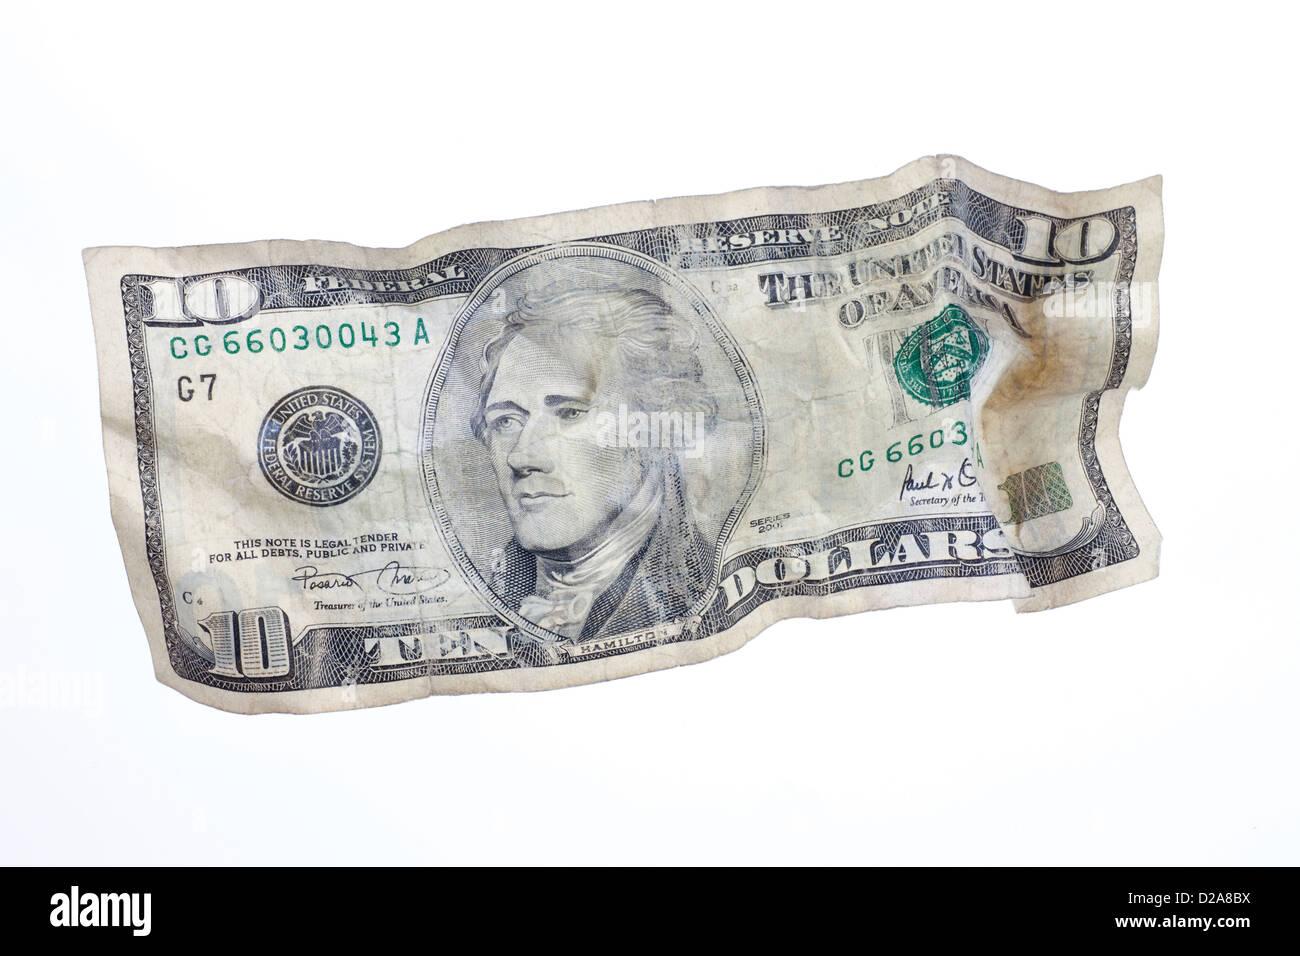 Berlin, Germany, crumpled U.S. dollar bill - Stock Image